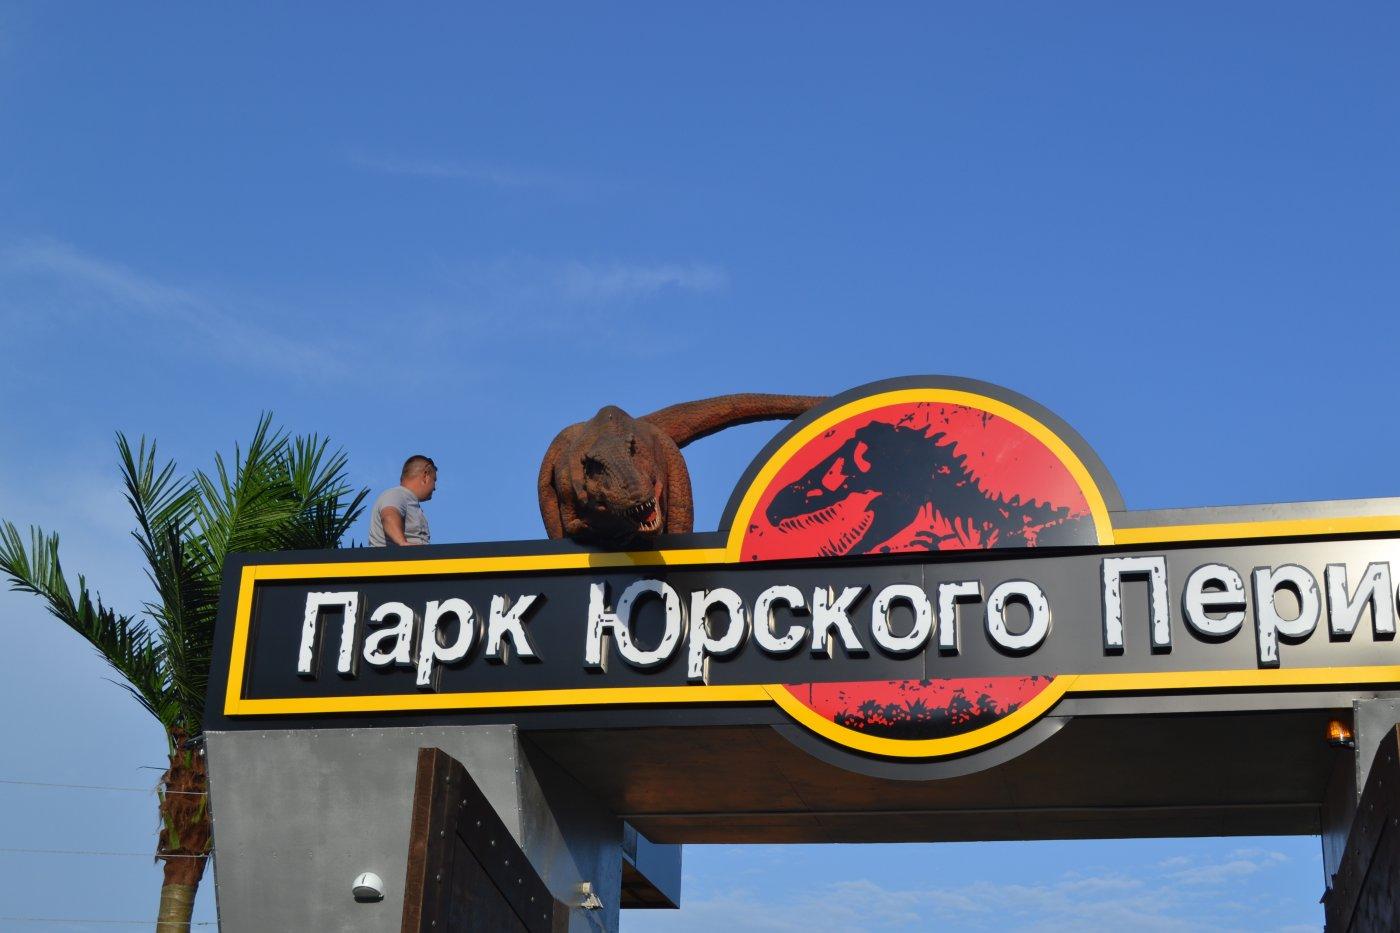 Фото DSC_0021.JPG. Россия, Краснодарский край, Джубга, улица Строителей